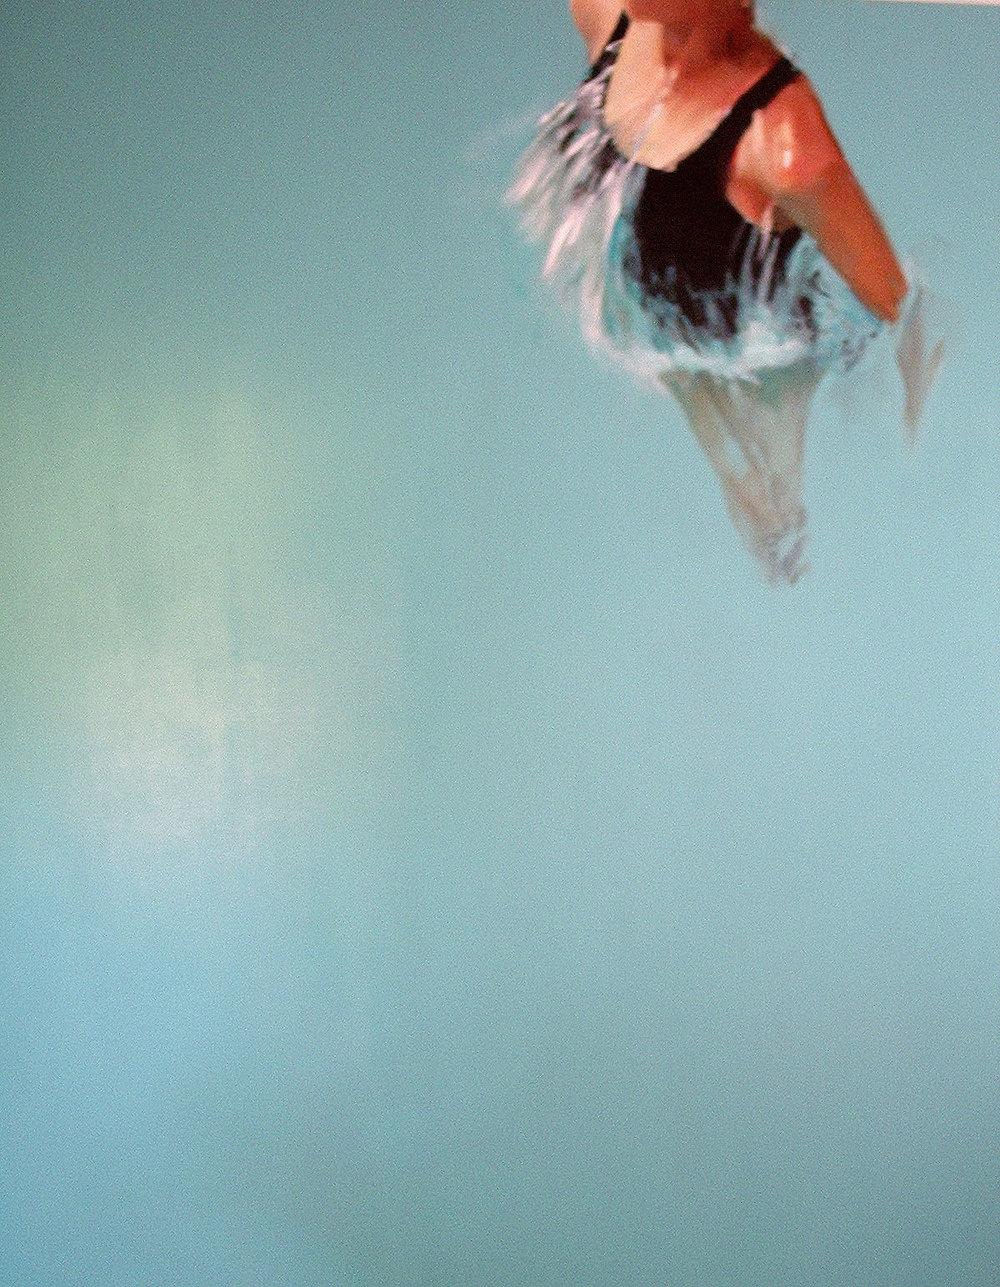 """Respiro"" 170 x 140 cms - 2007."